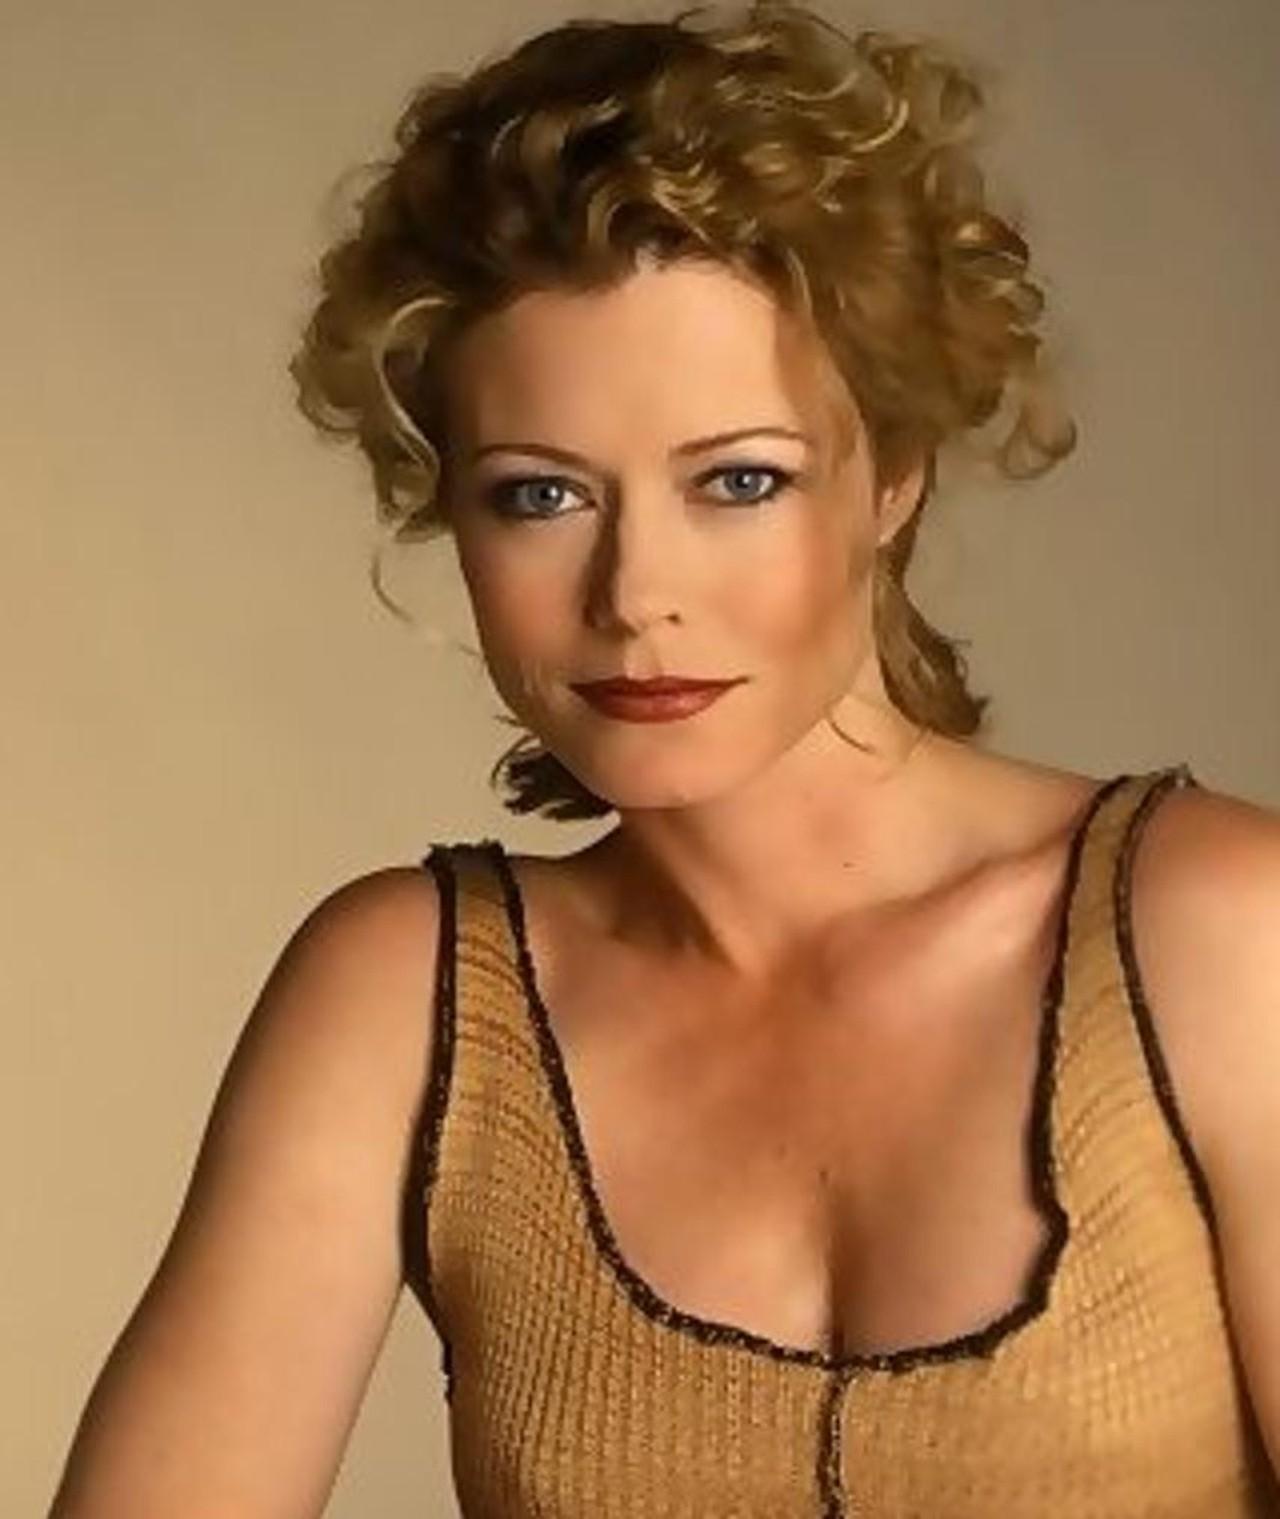 More Pics of Sheree J. Wilson Nude Lipstick (1 of 2